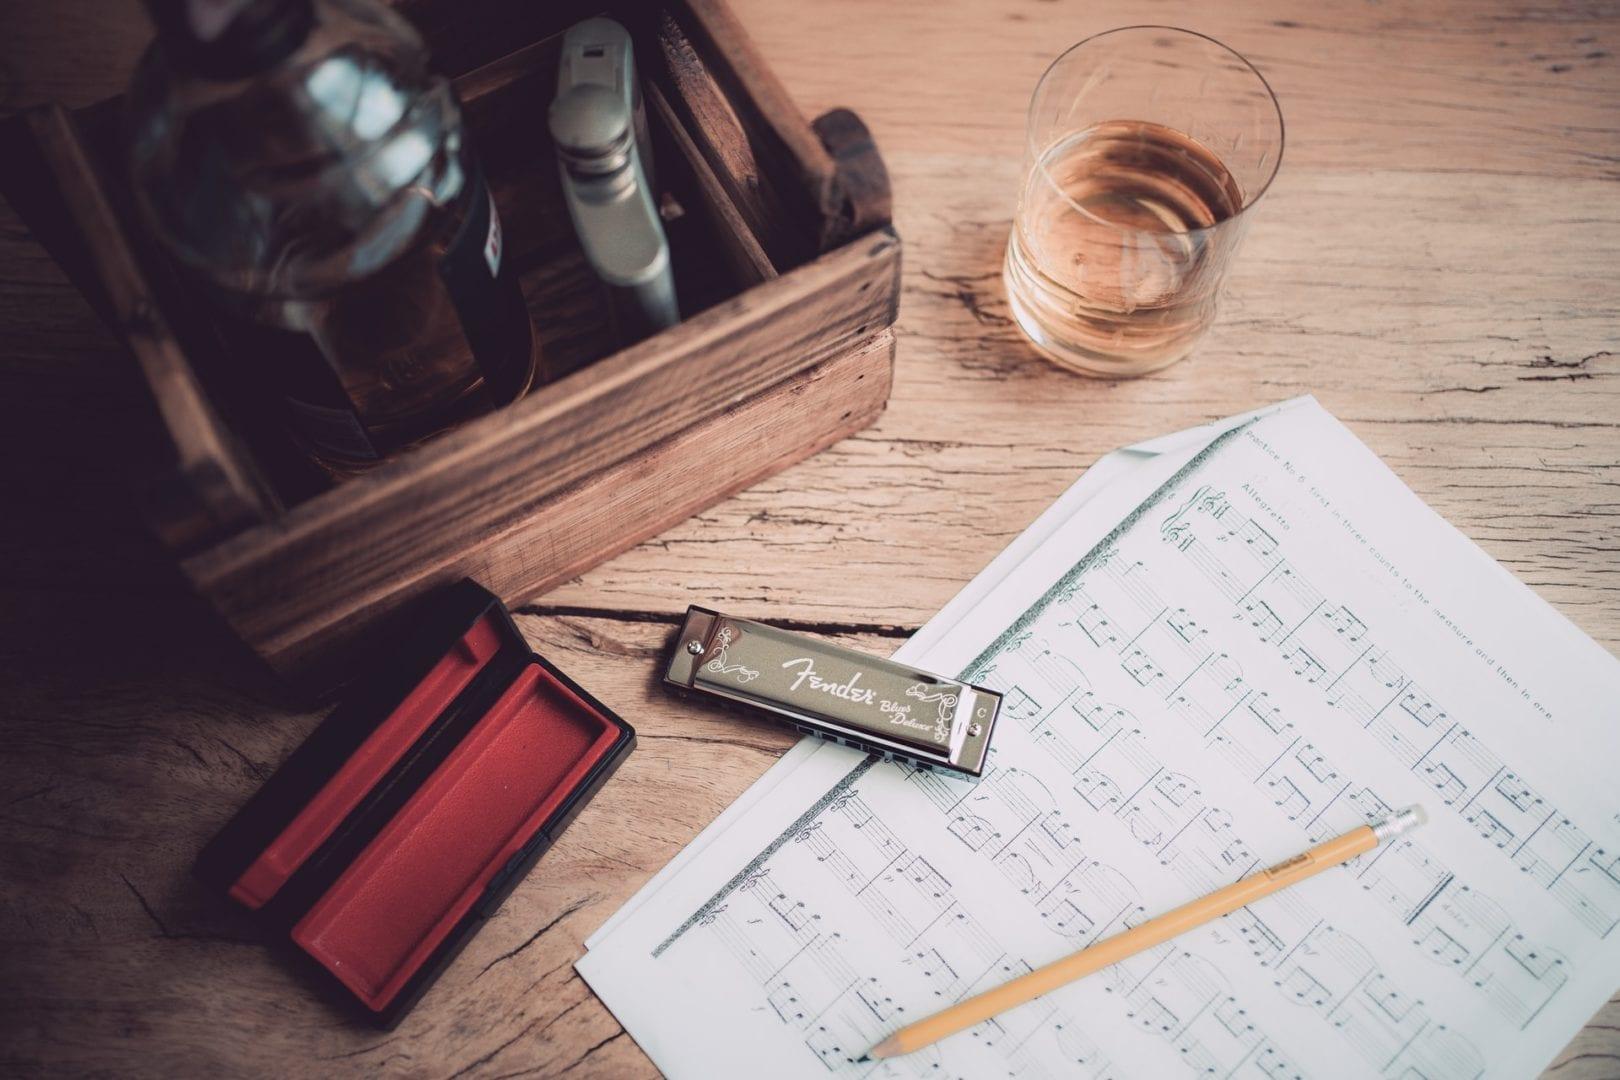 Mundharmonika liegt neben Tabulatur und Notentext